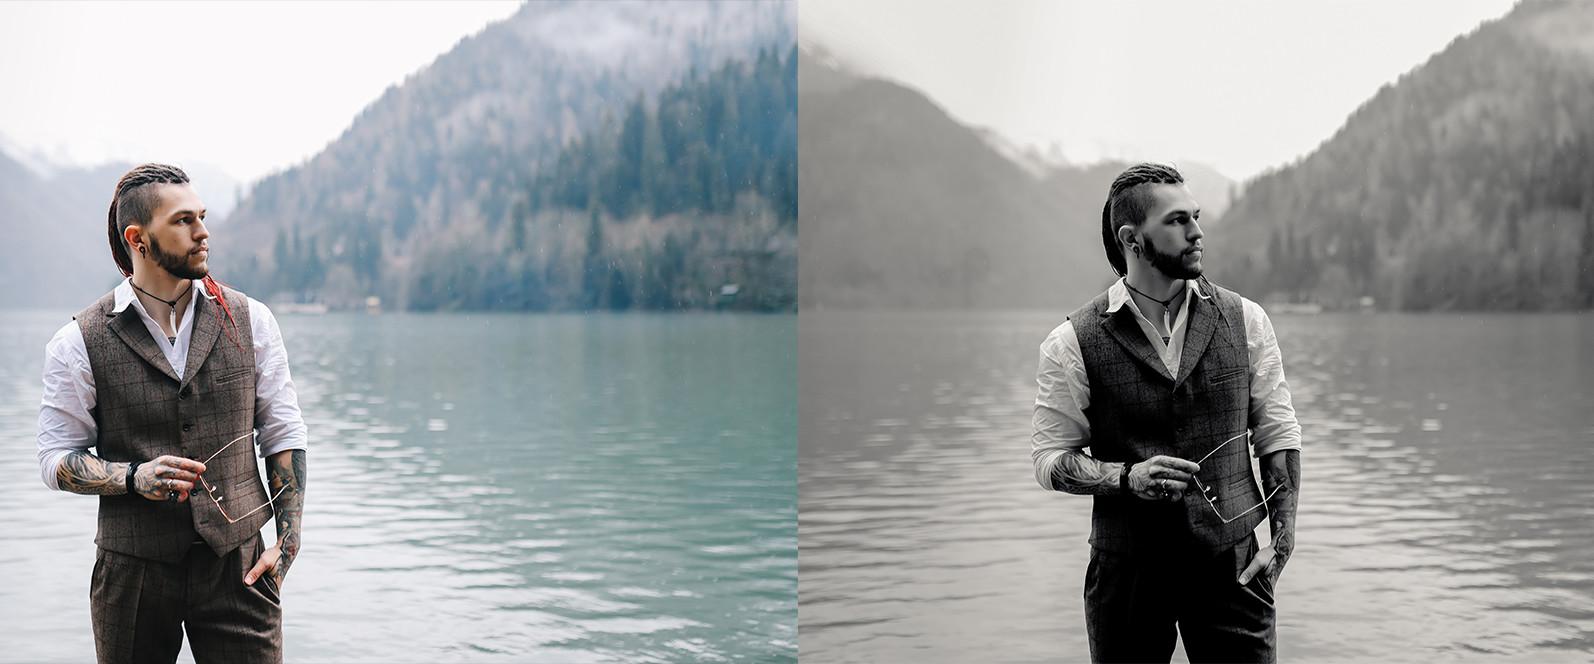 15 x Lightroom Presets, Monochrome Men Presets, Black and White Presets, Portrait Presets - 12 Monochrome Men 13 -